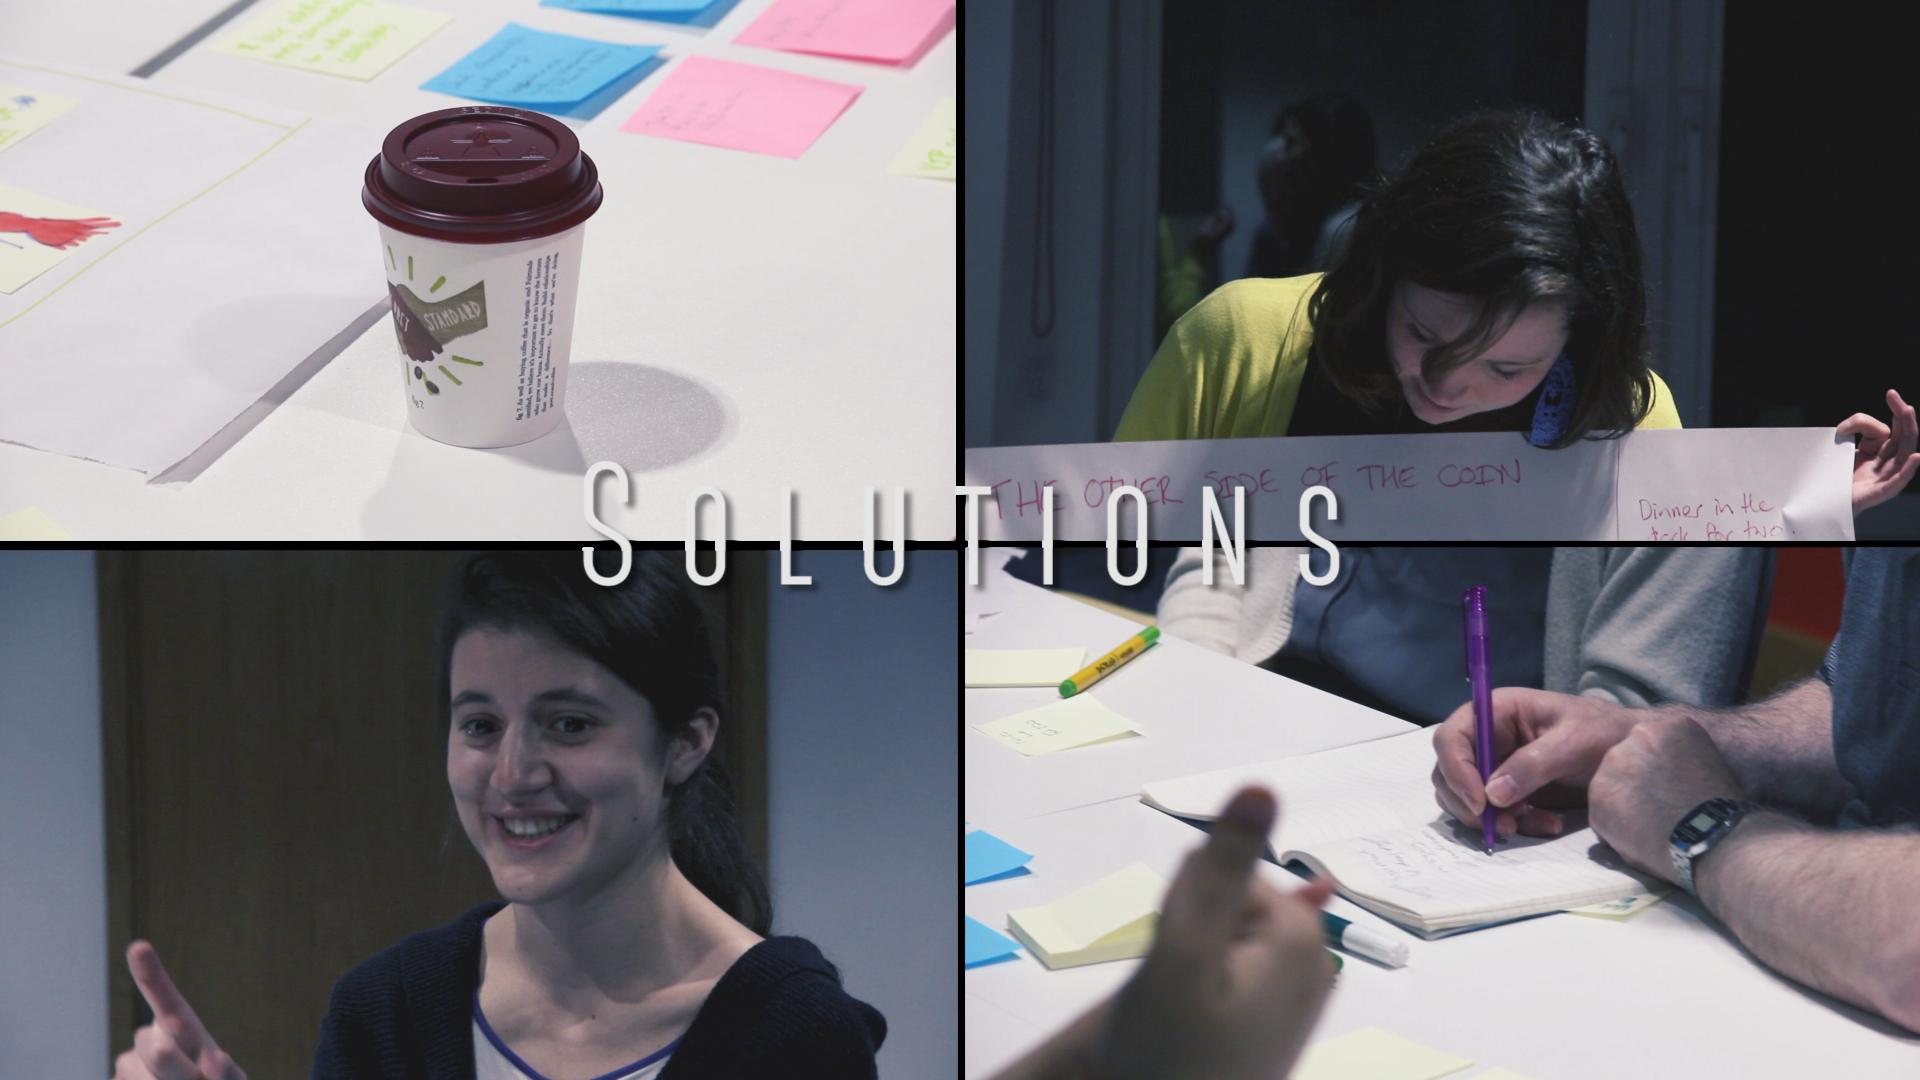 "<img src=""Bepartofit-HUB-solutions.jpg"" alt text= ""Bepartofit HUB Solutions"" />"